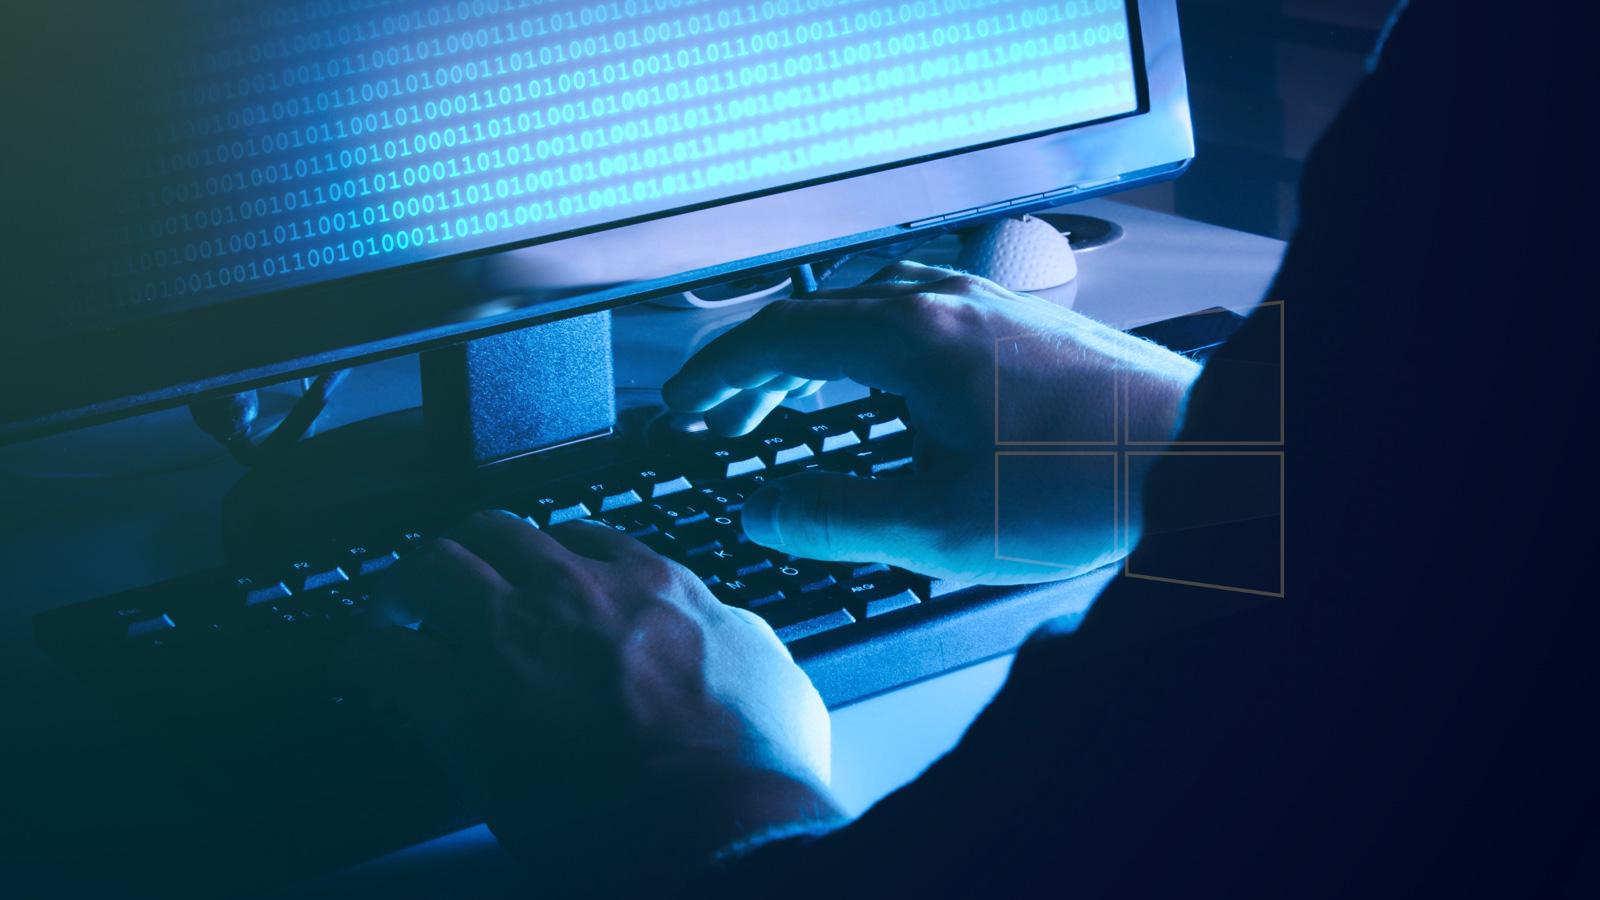 Beware of Windows 11 Alpha-themed malicious Microsoft Word docs